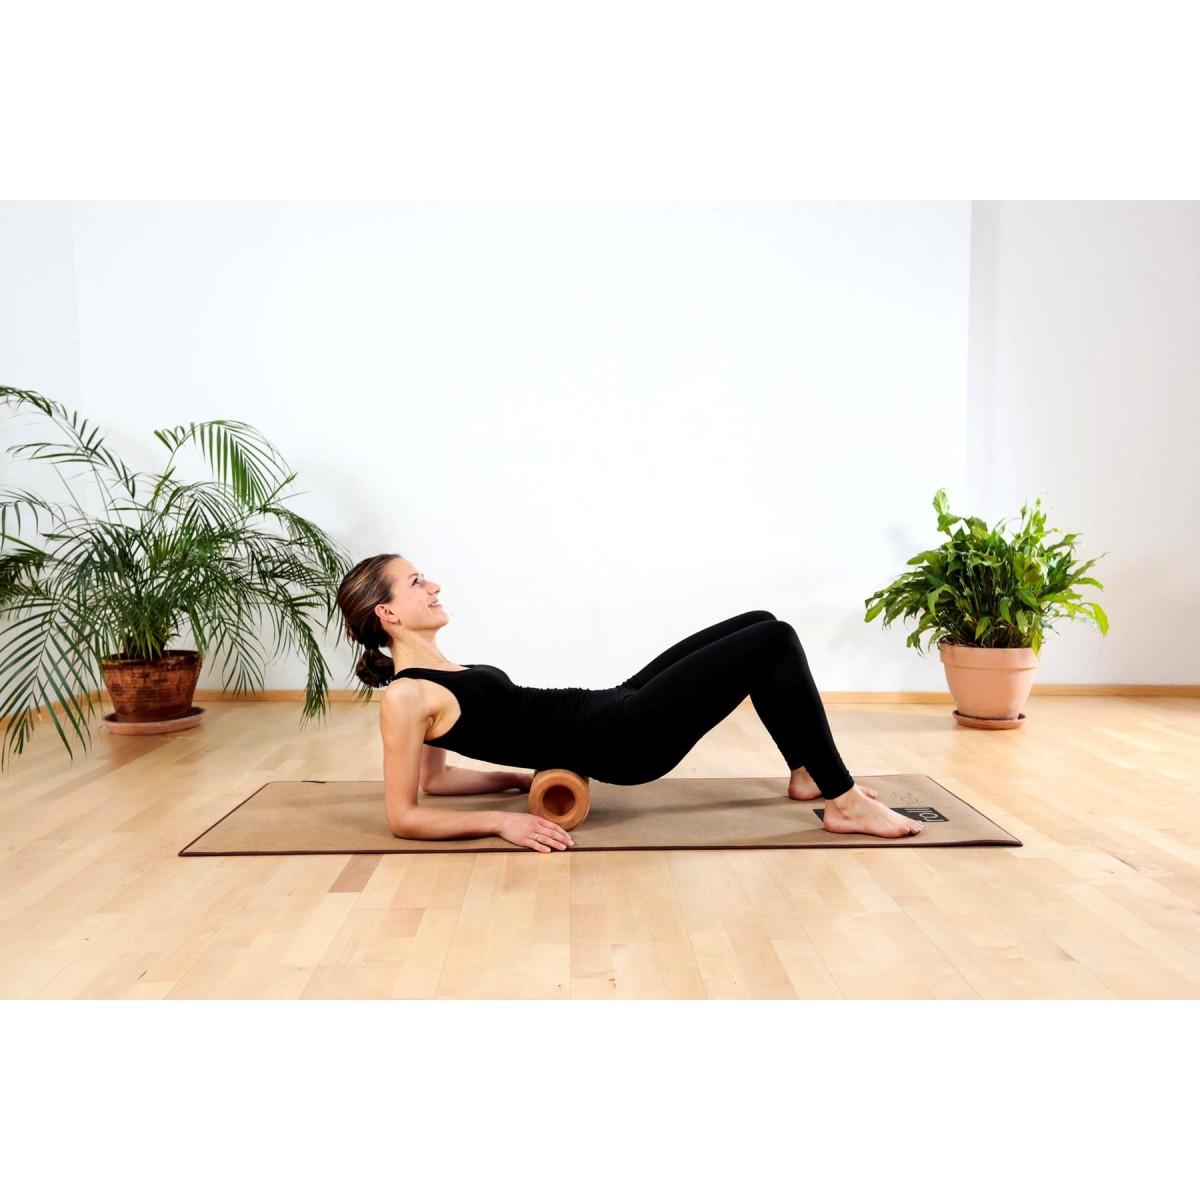 rollholz – großes Massage Set für punktuelle & flächige Behandlung